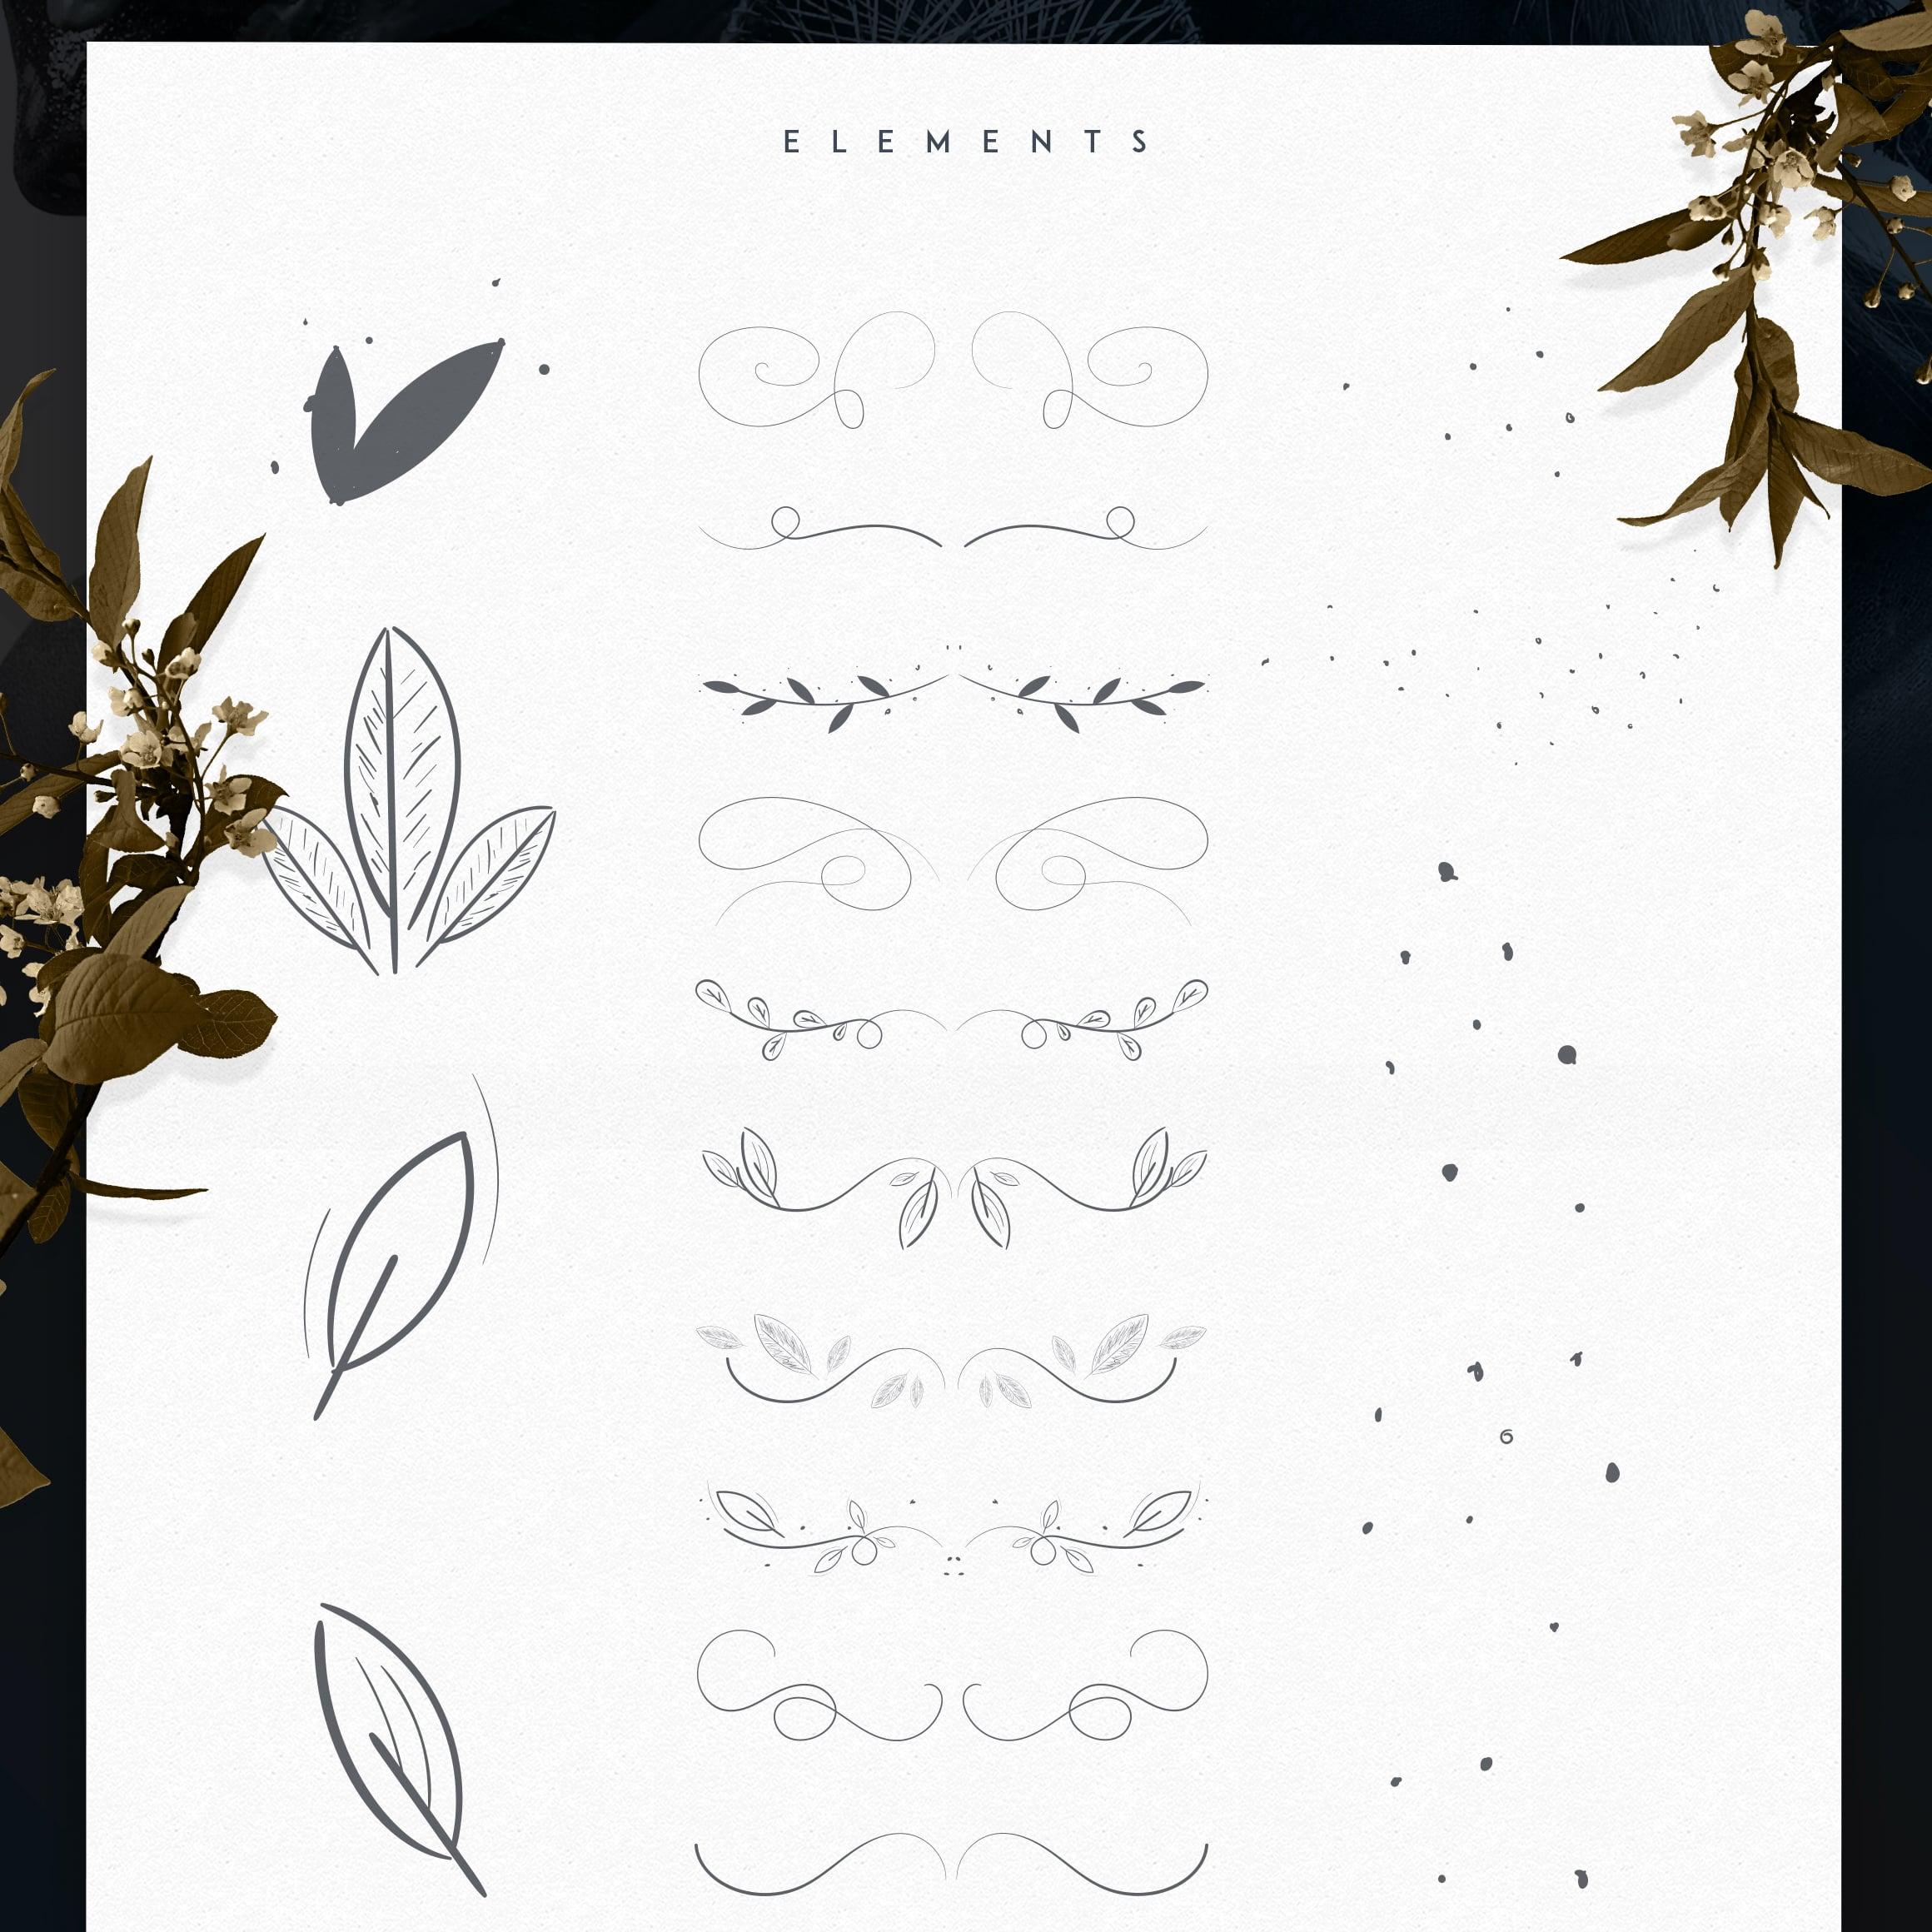 Emanuela Typeface cover image.